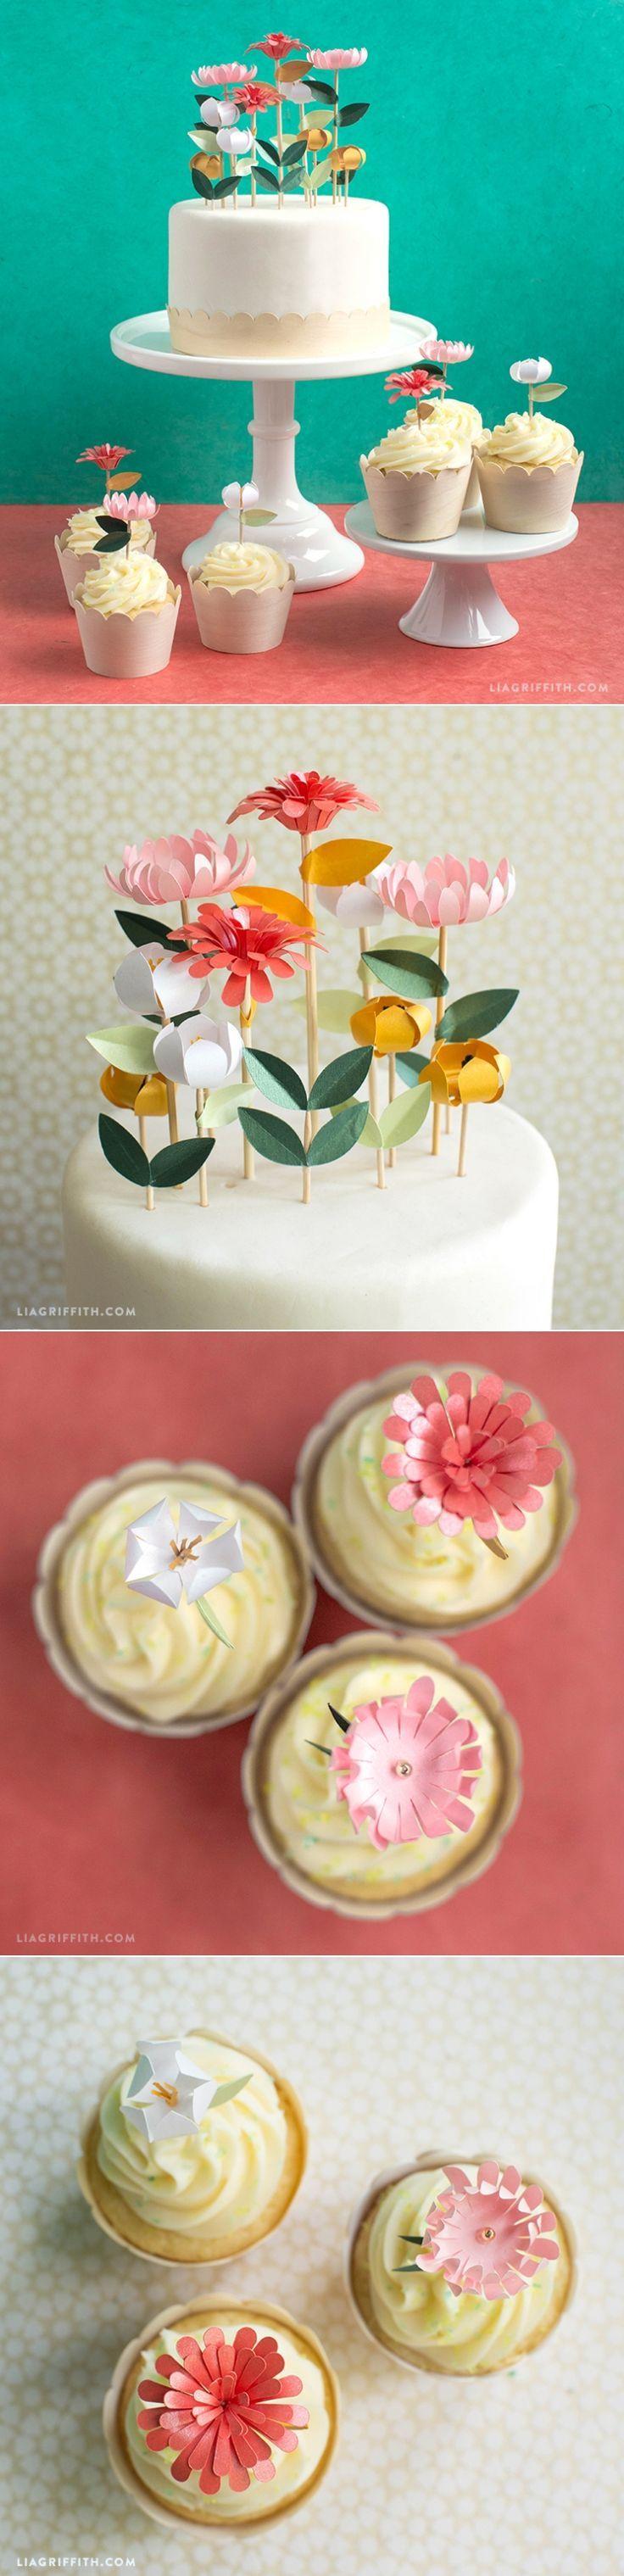 Diy flower cake toppers birthday cake decorating flower